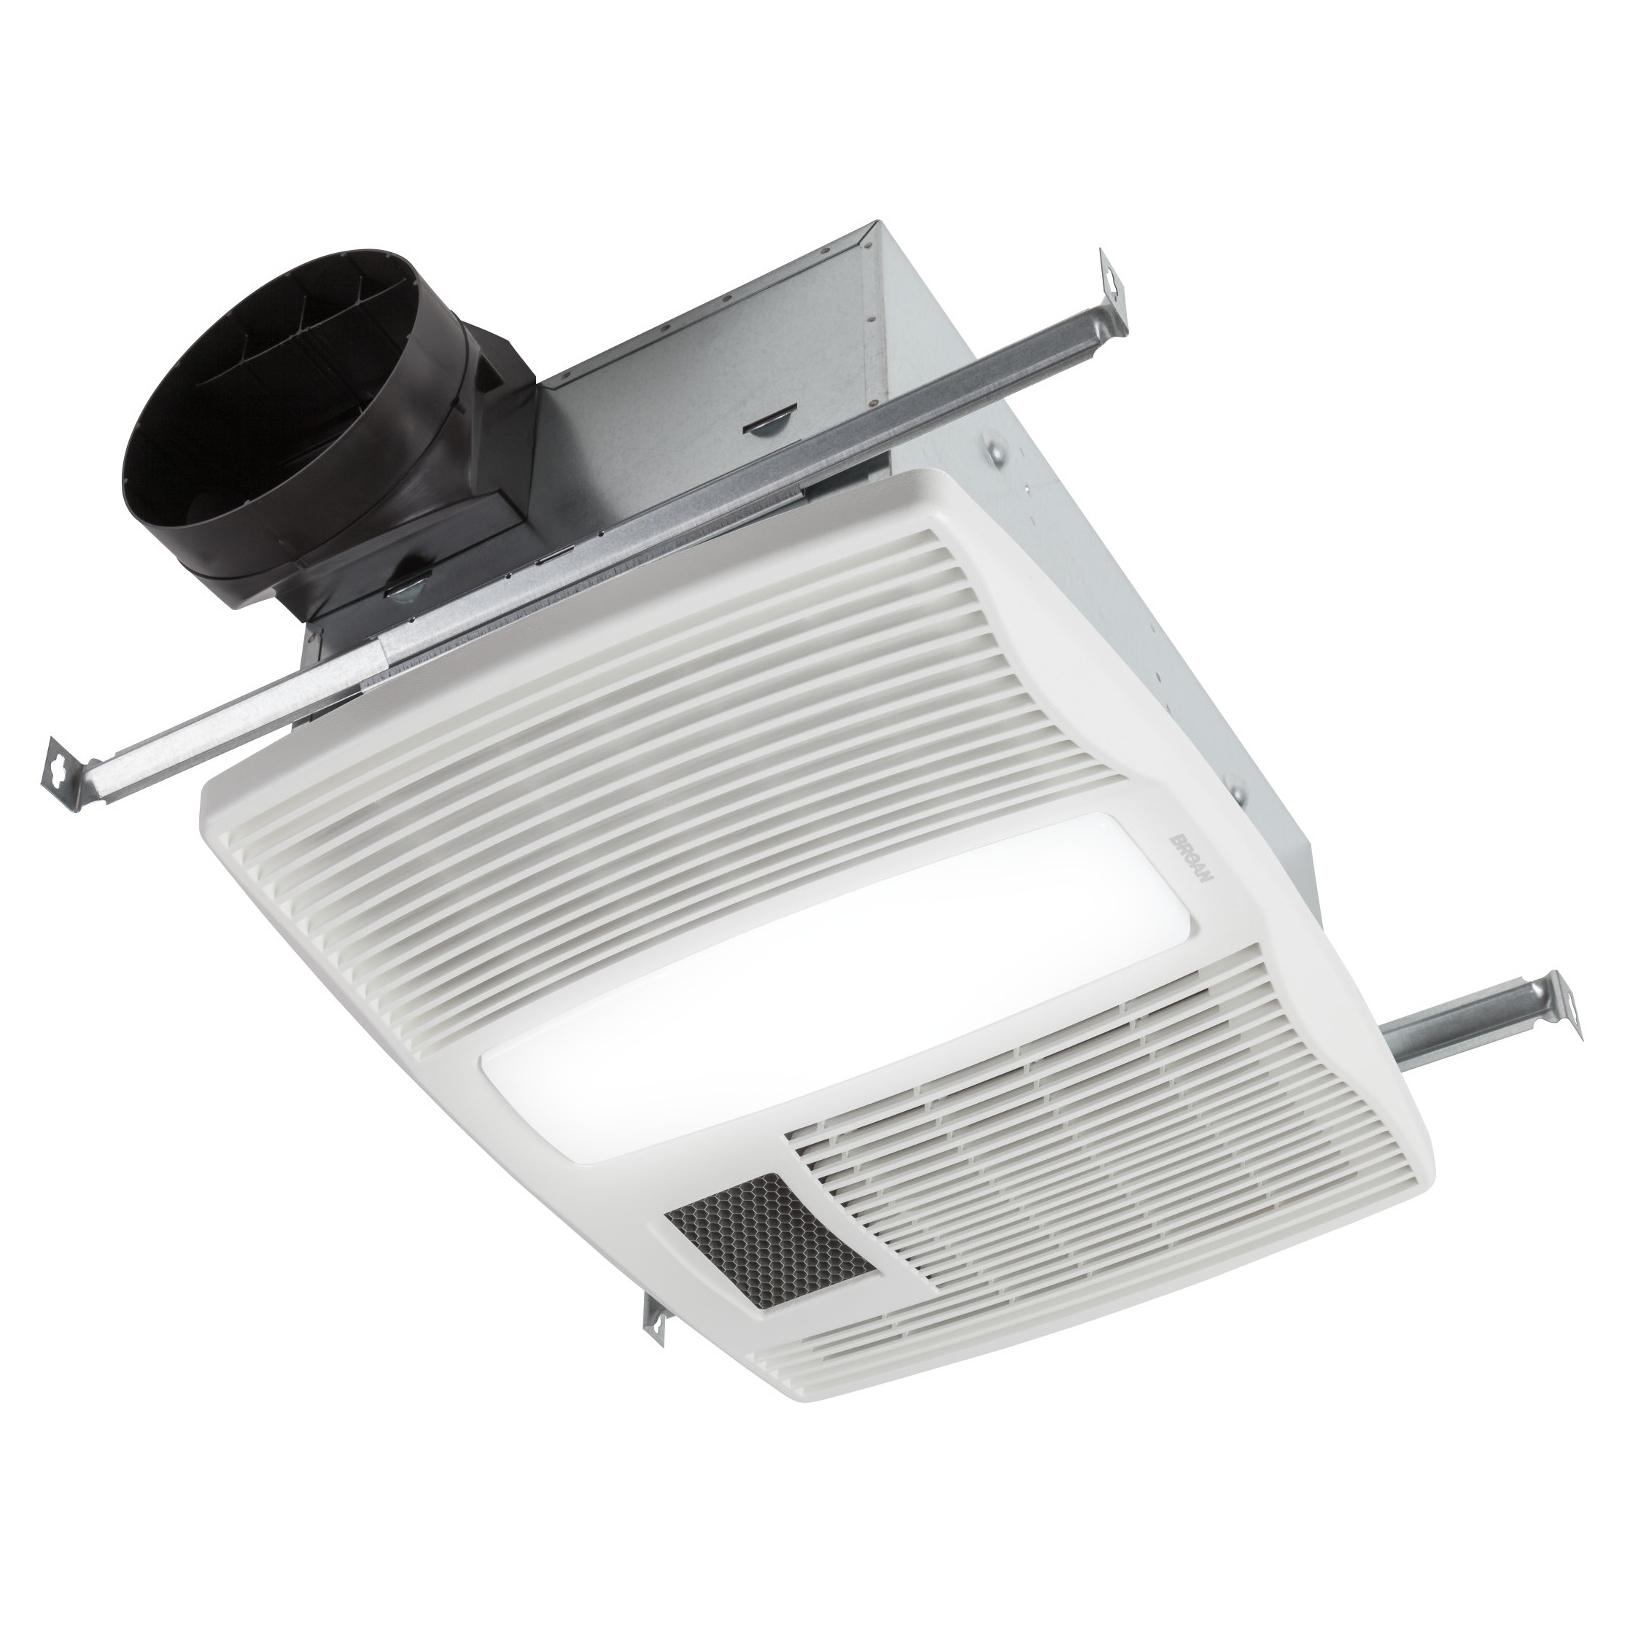 Round Bathroom Fan Light Combination: Broan QTX110HL Ultra Silent Series Bath Fan With Heater